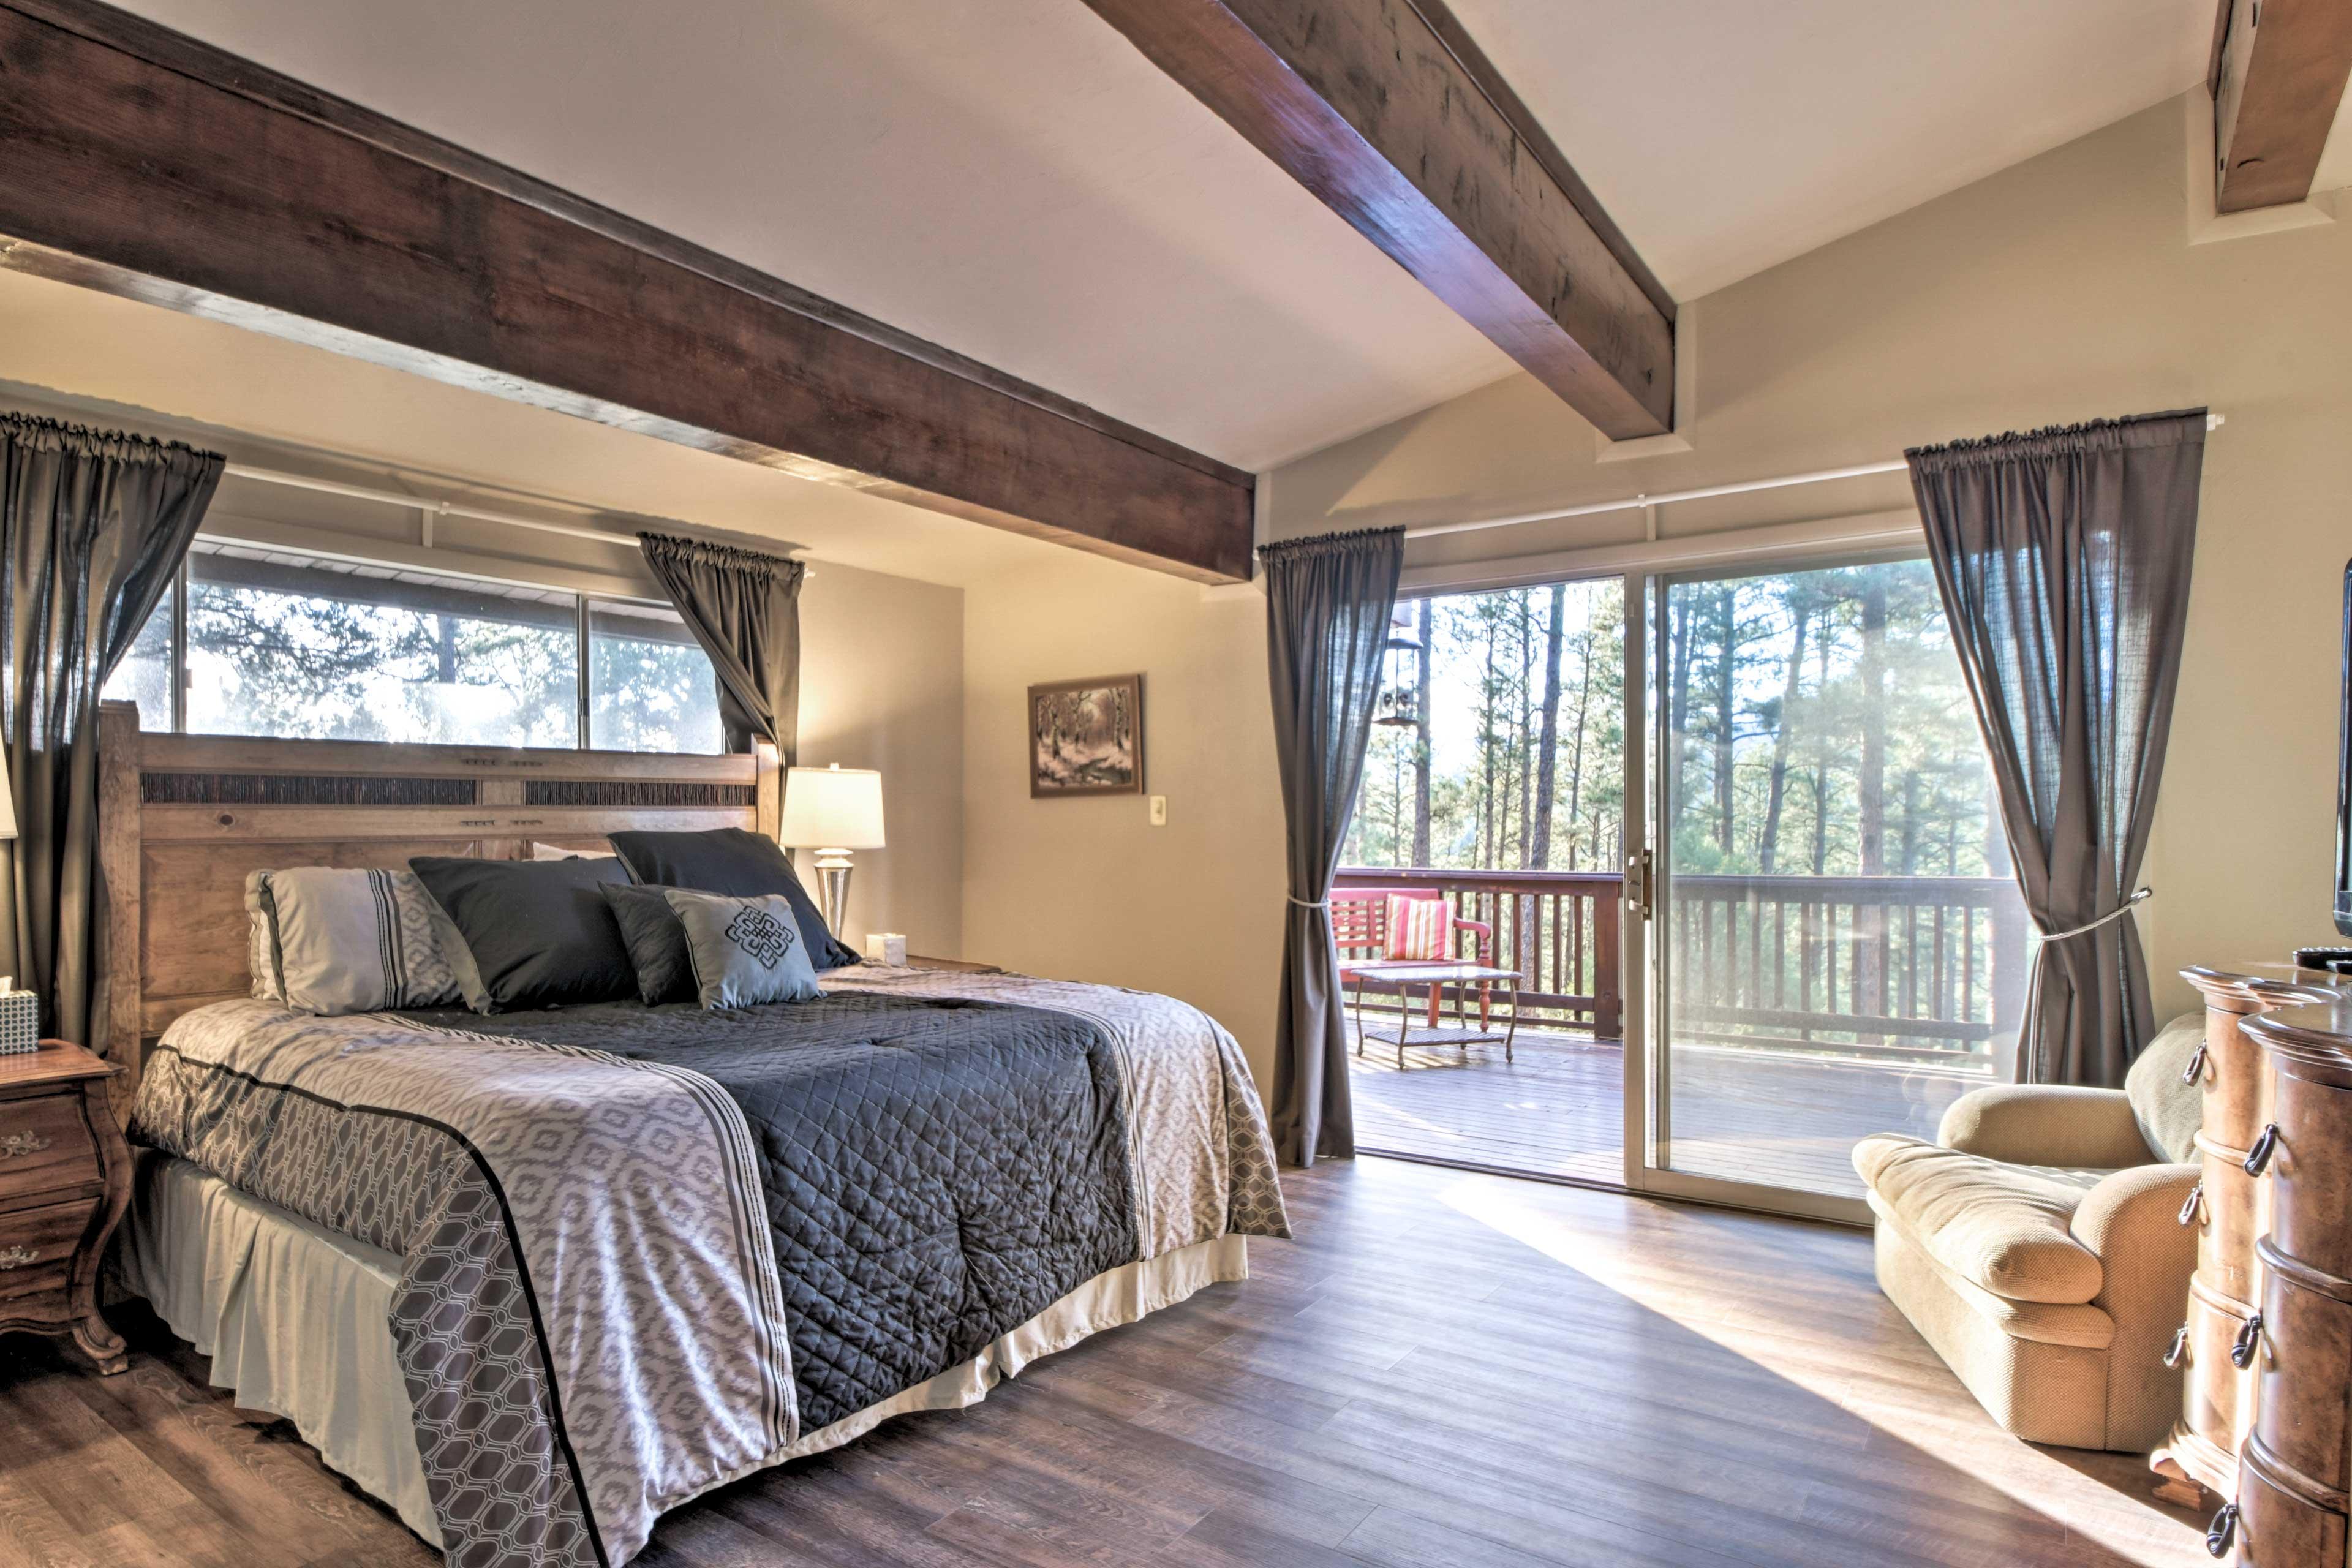 Open wood beams extend across the master bedroom.